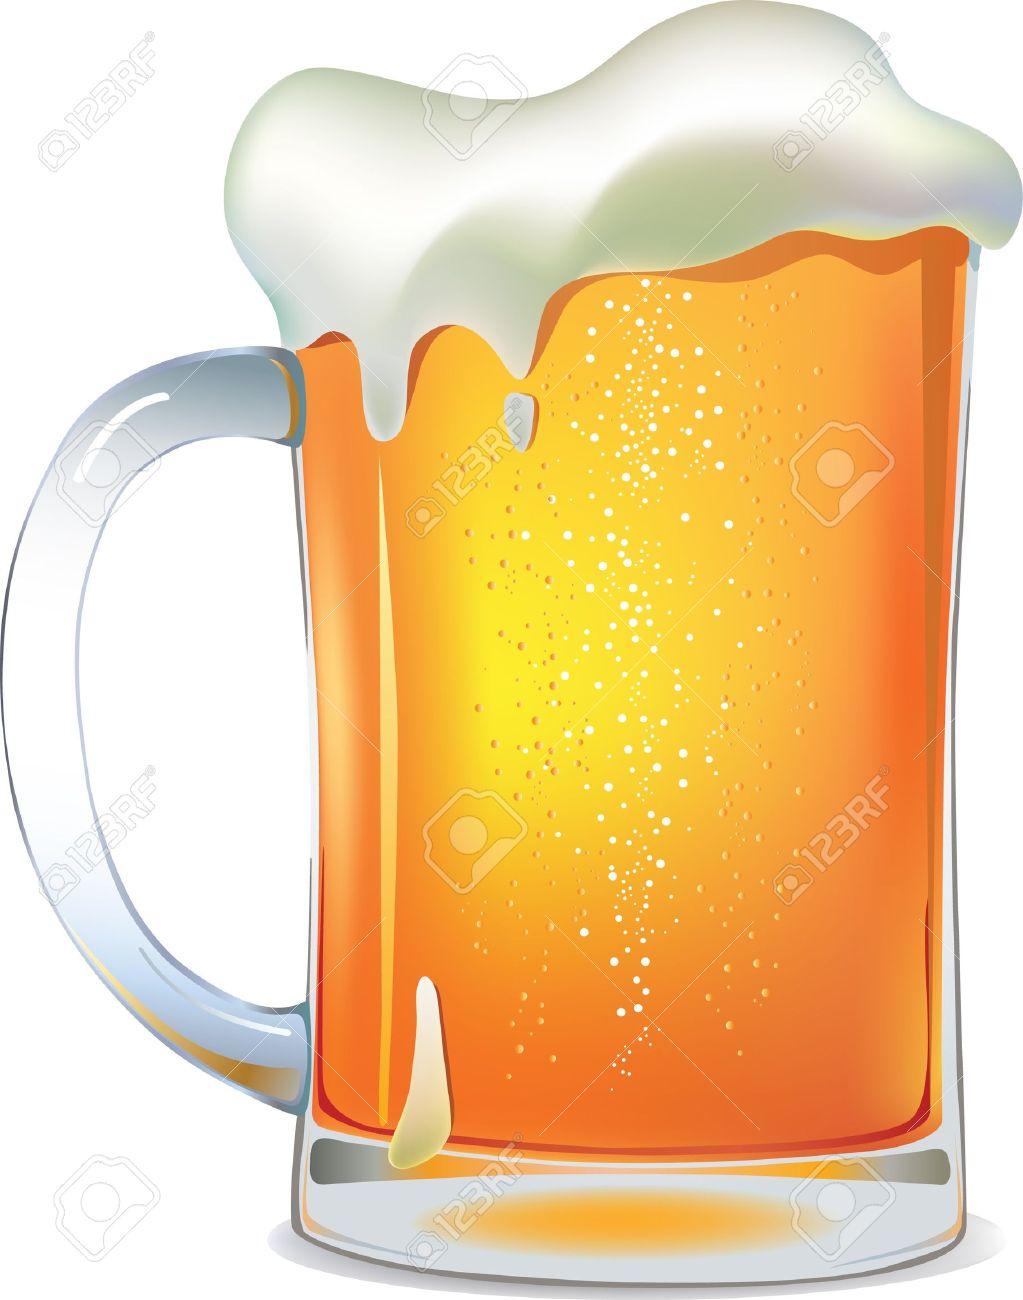 light beer mug royalty free cliparts vectors and stock rh 123rf com beer mug clipart vector beer mug clipart vector